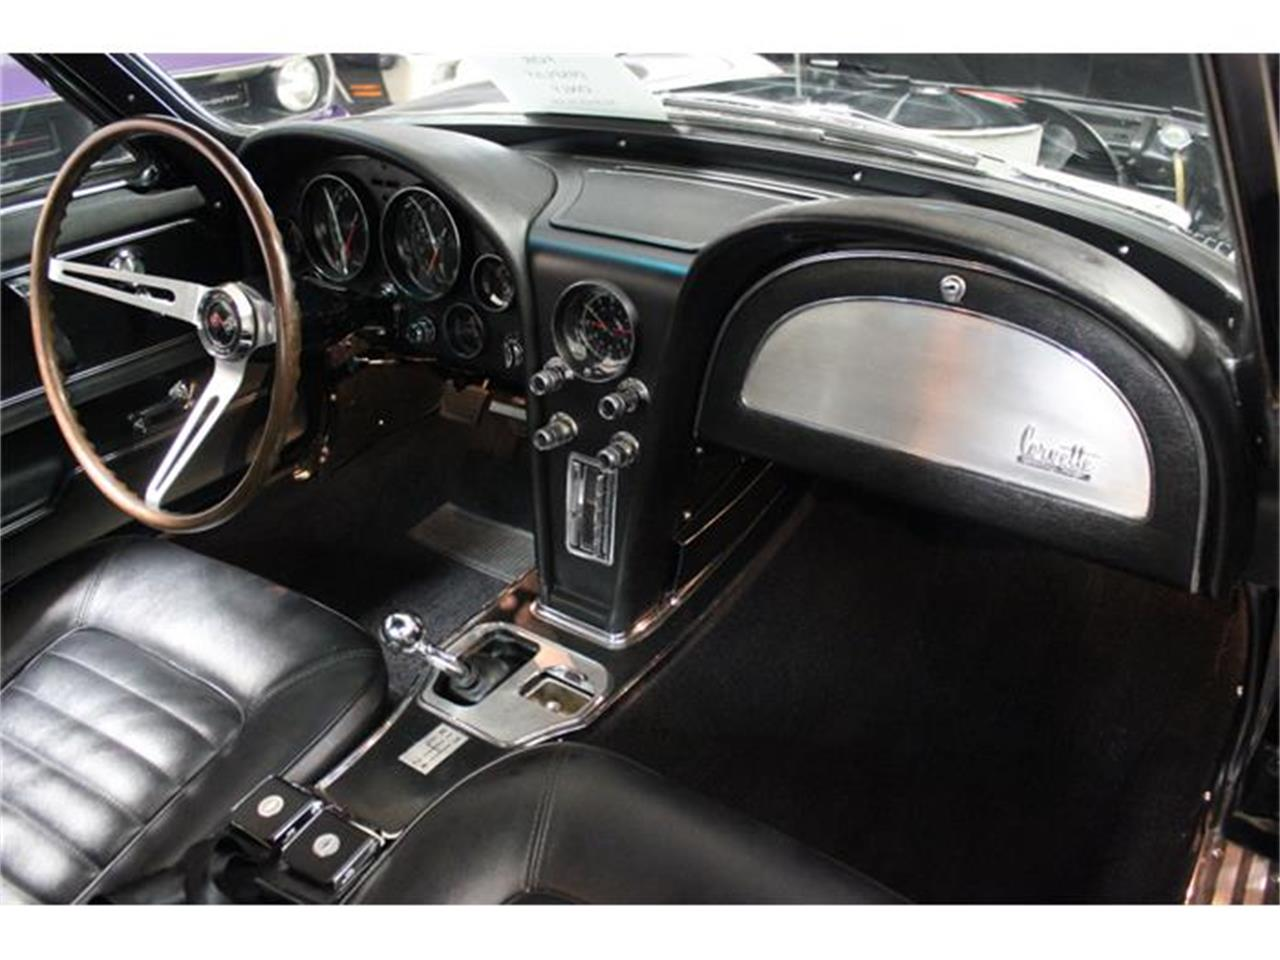 Large Picture of Classic '66 Chevrolet Corvette located in California - EU77